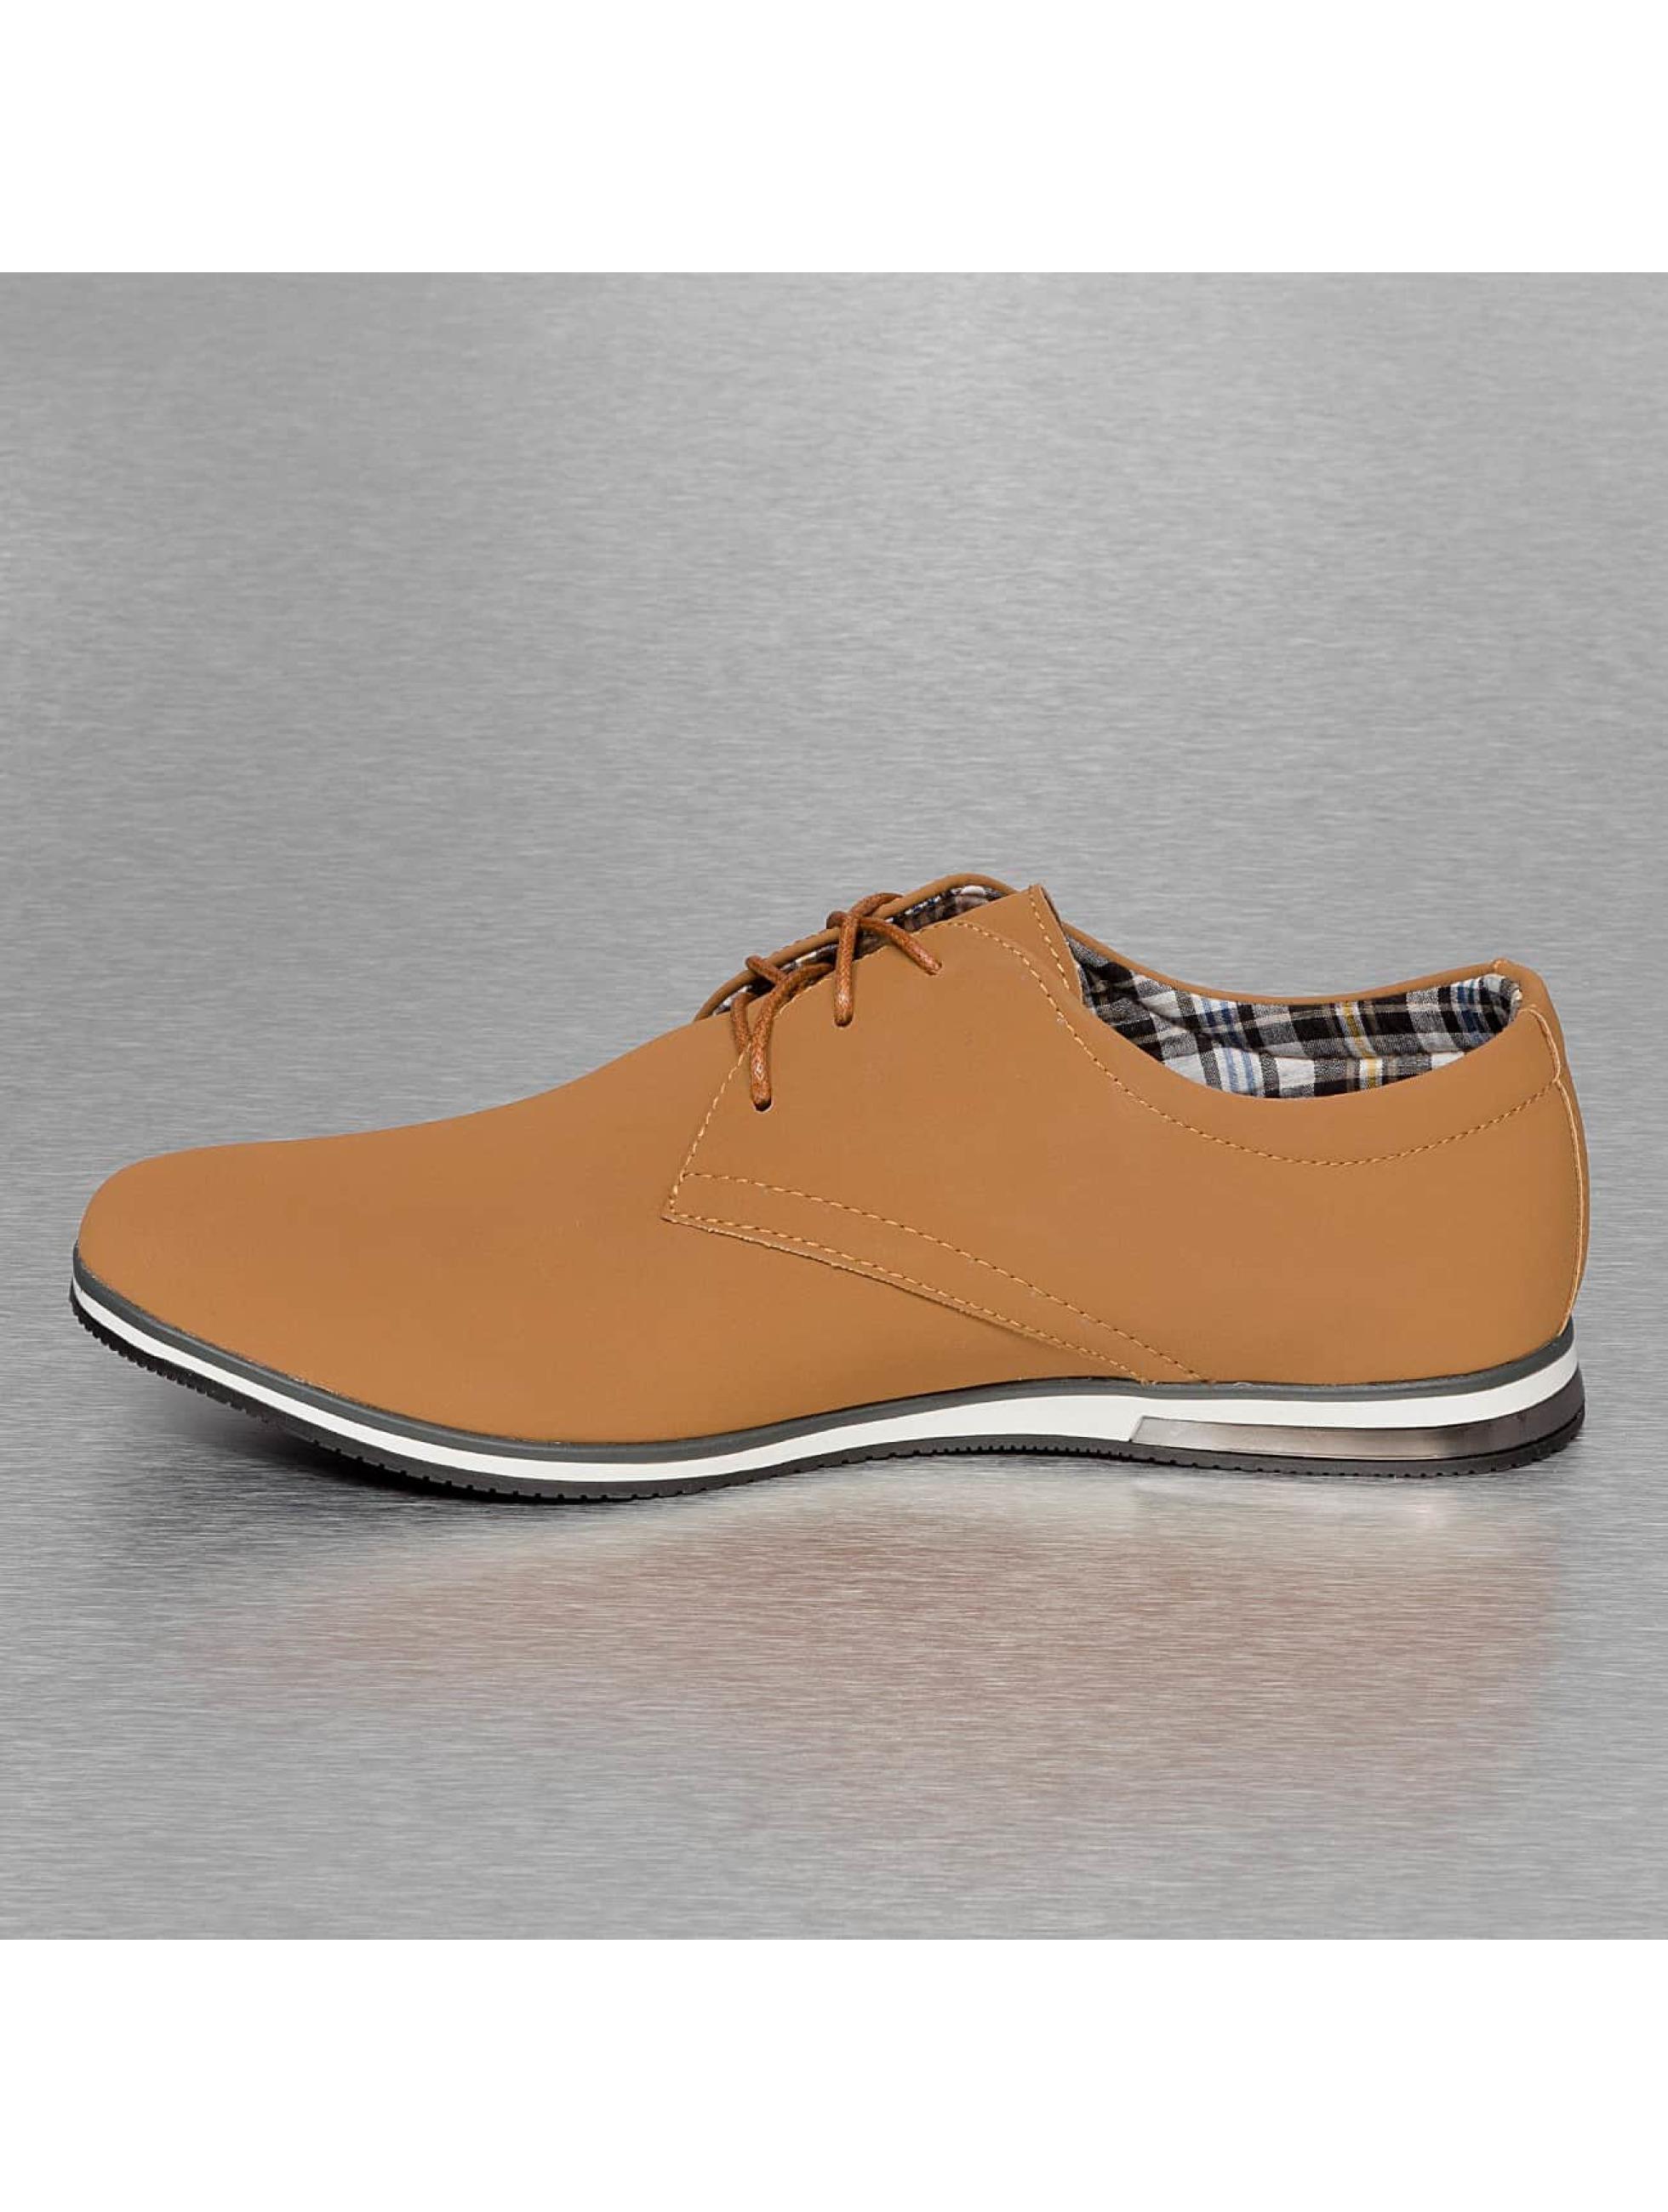 New York Style Sneaker Galway braun